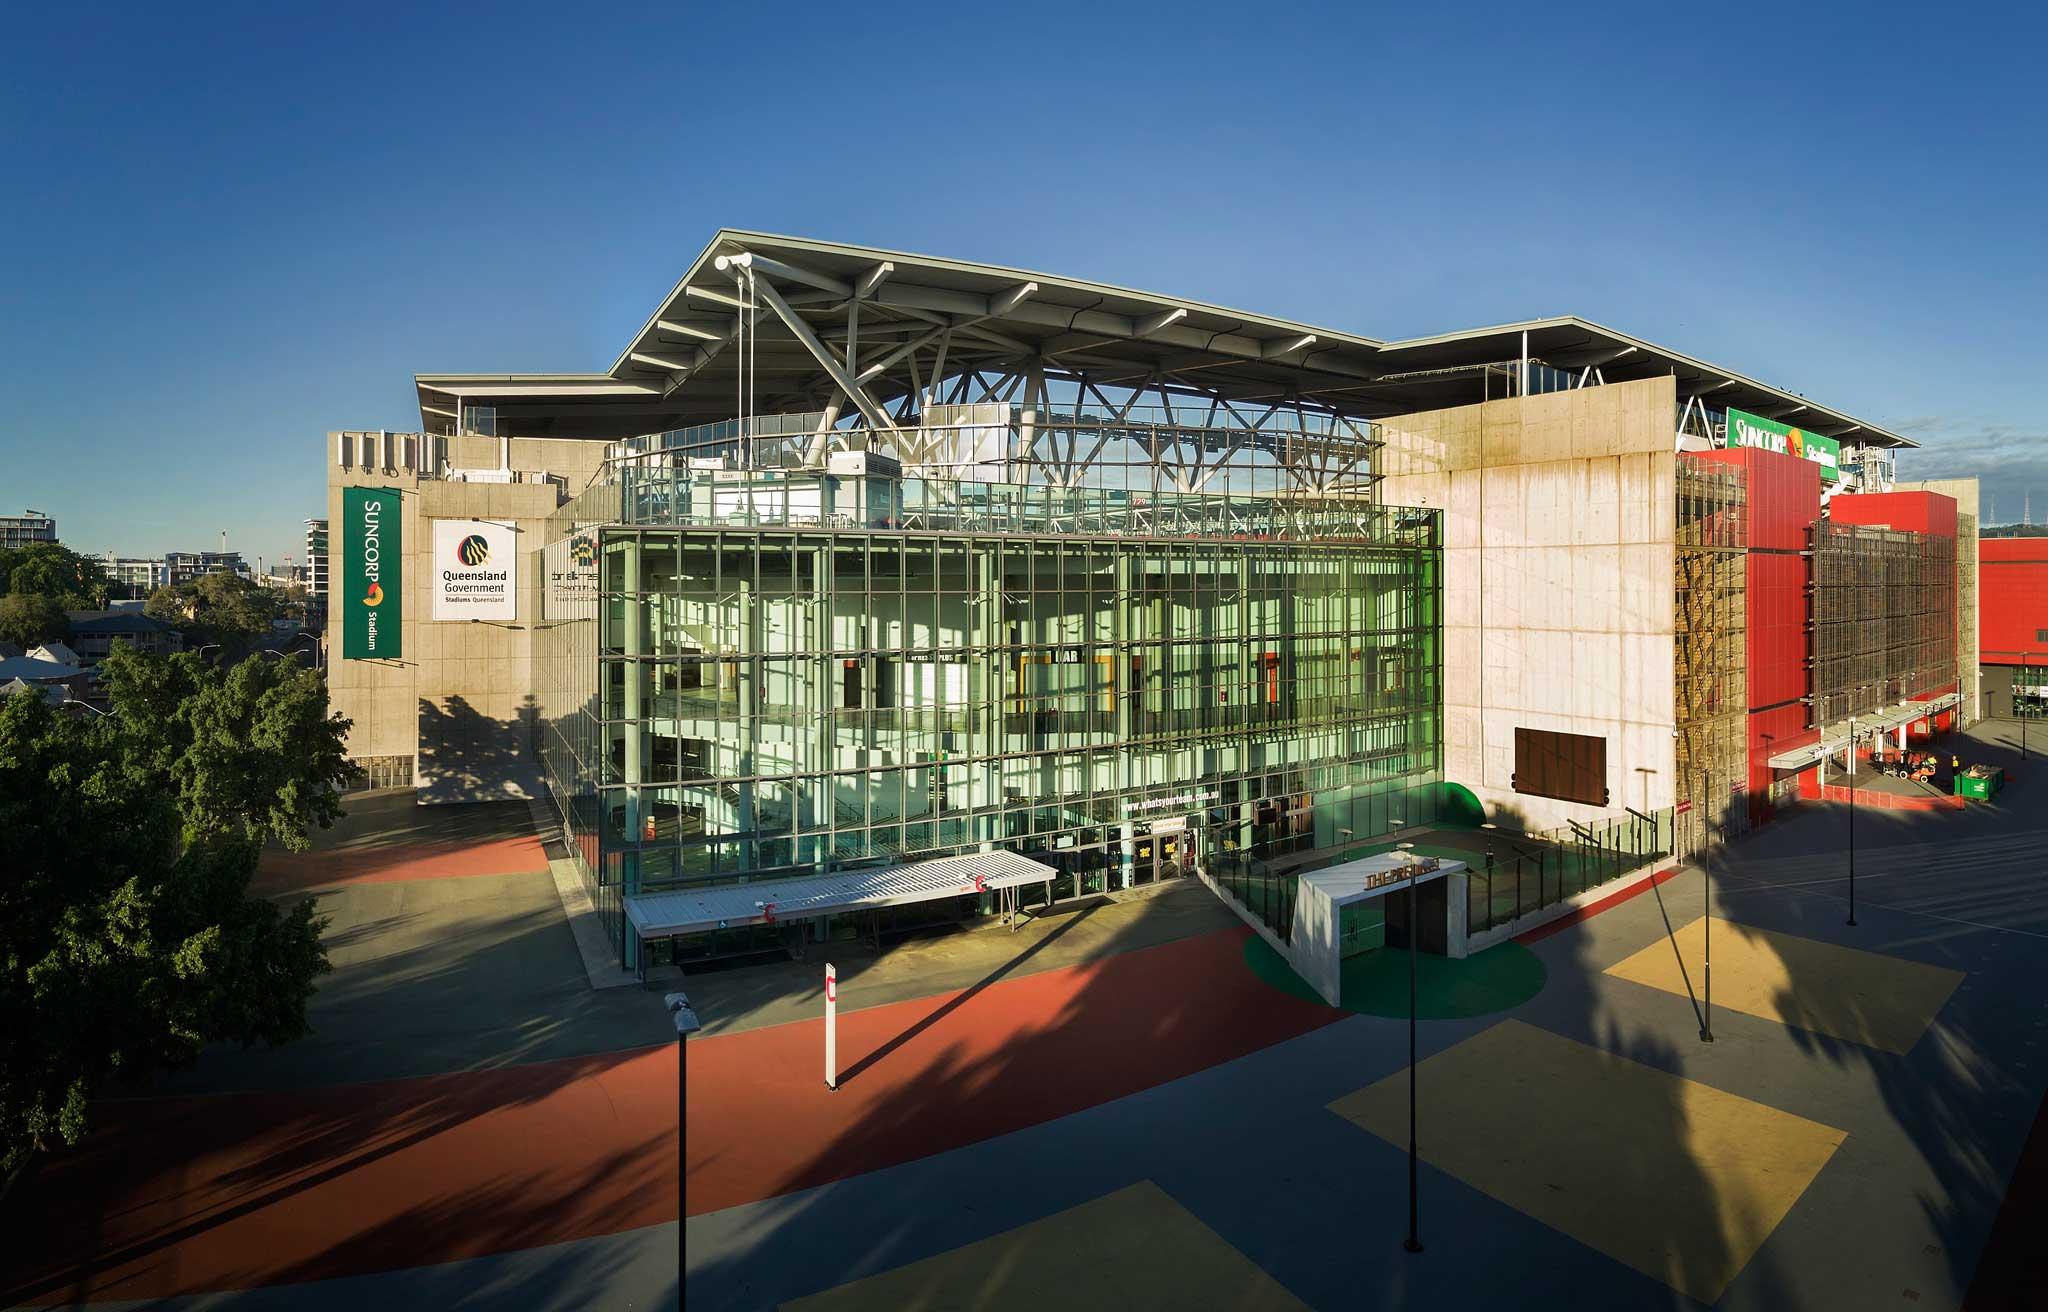 Suncorp Stadium Aerial Drone Panorama 15m AGL -DroneAce